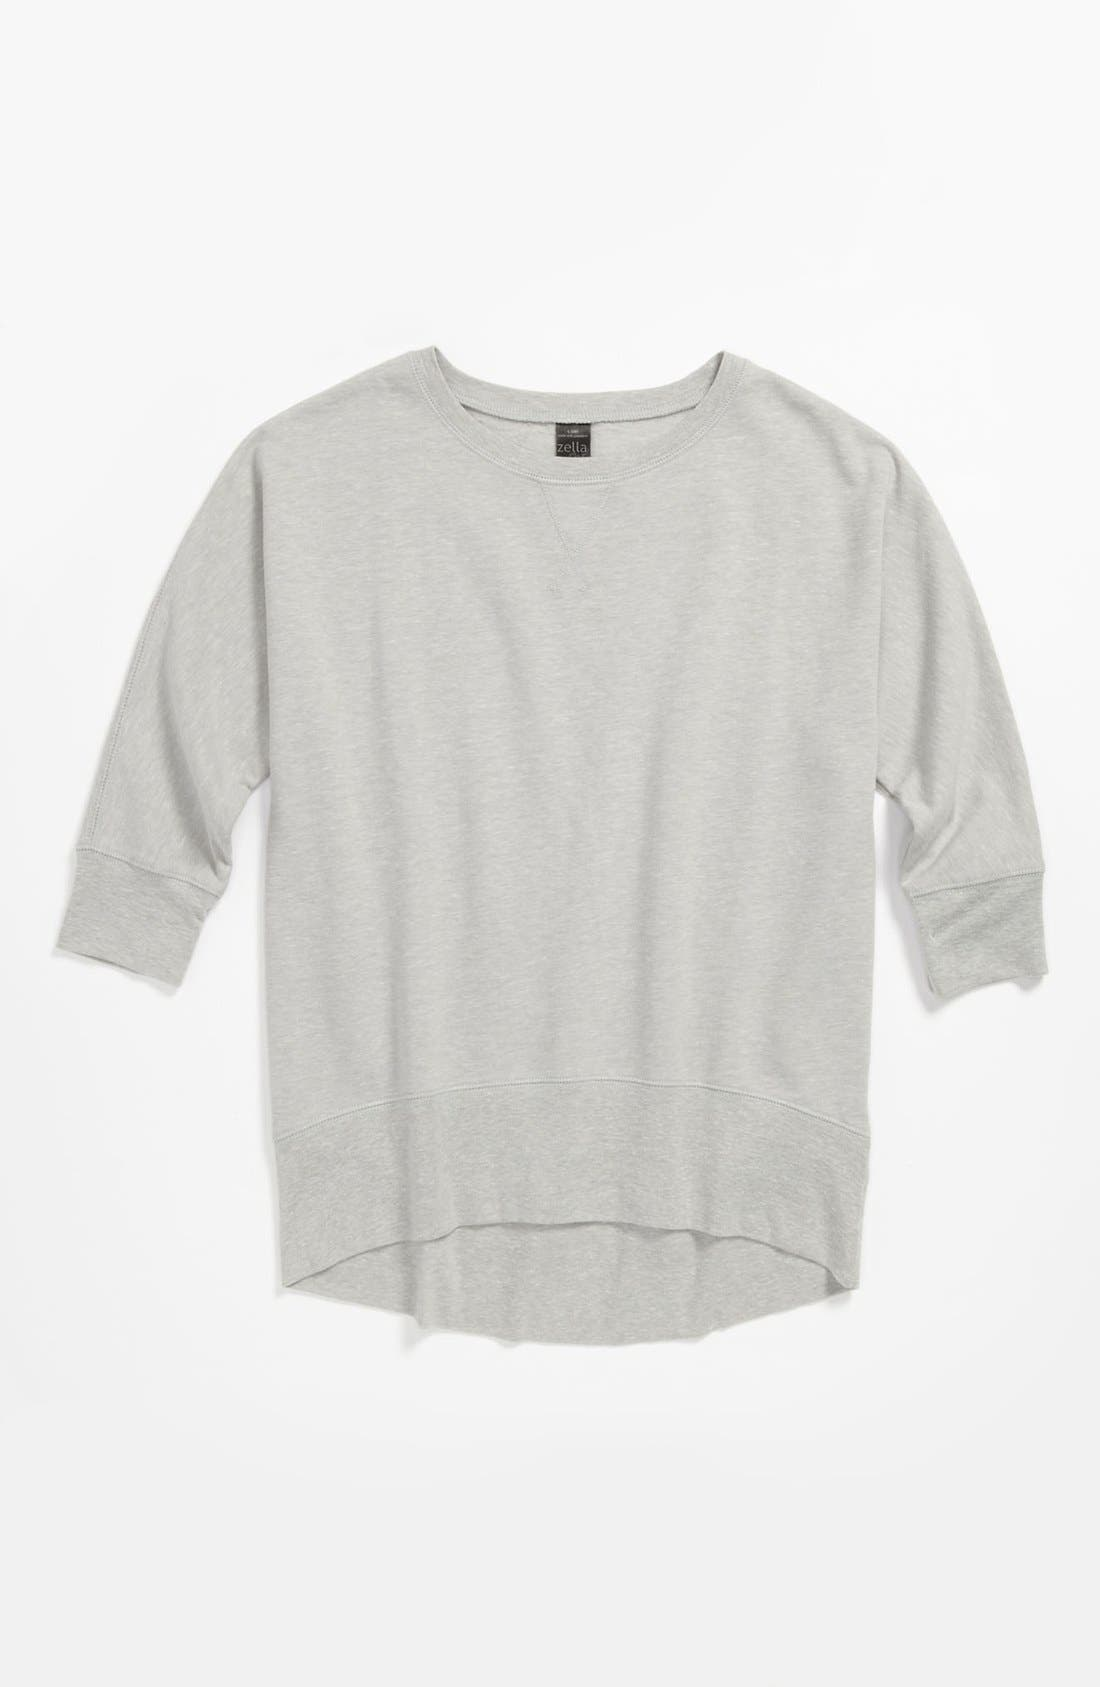 Alternate Image 1 Selected - Zella Girl 'Hip Hop' Sweatshirt (Little Girls & Big Girls)